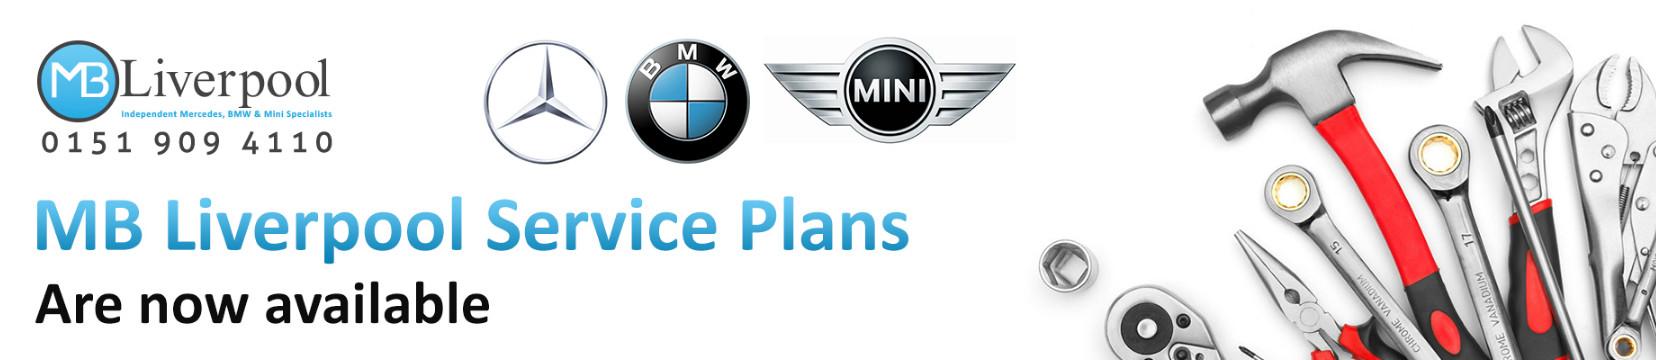 Liverpool Mini Service Plans